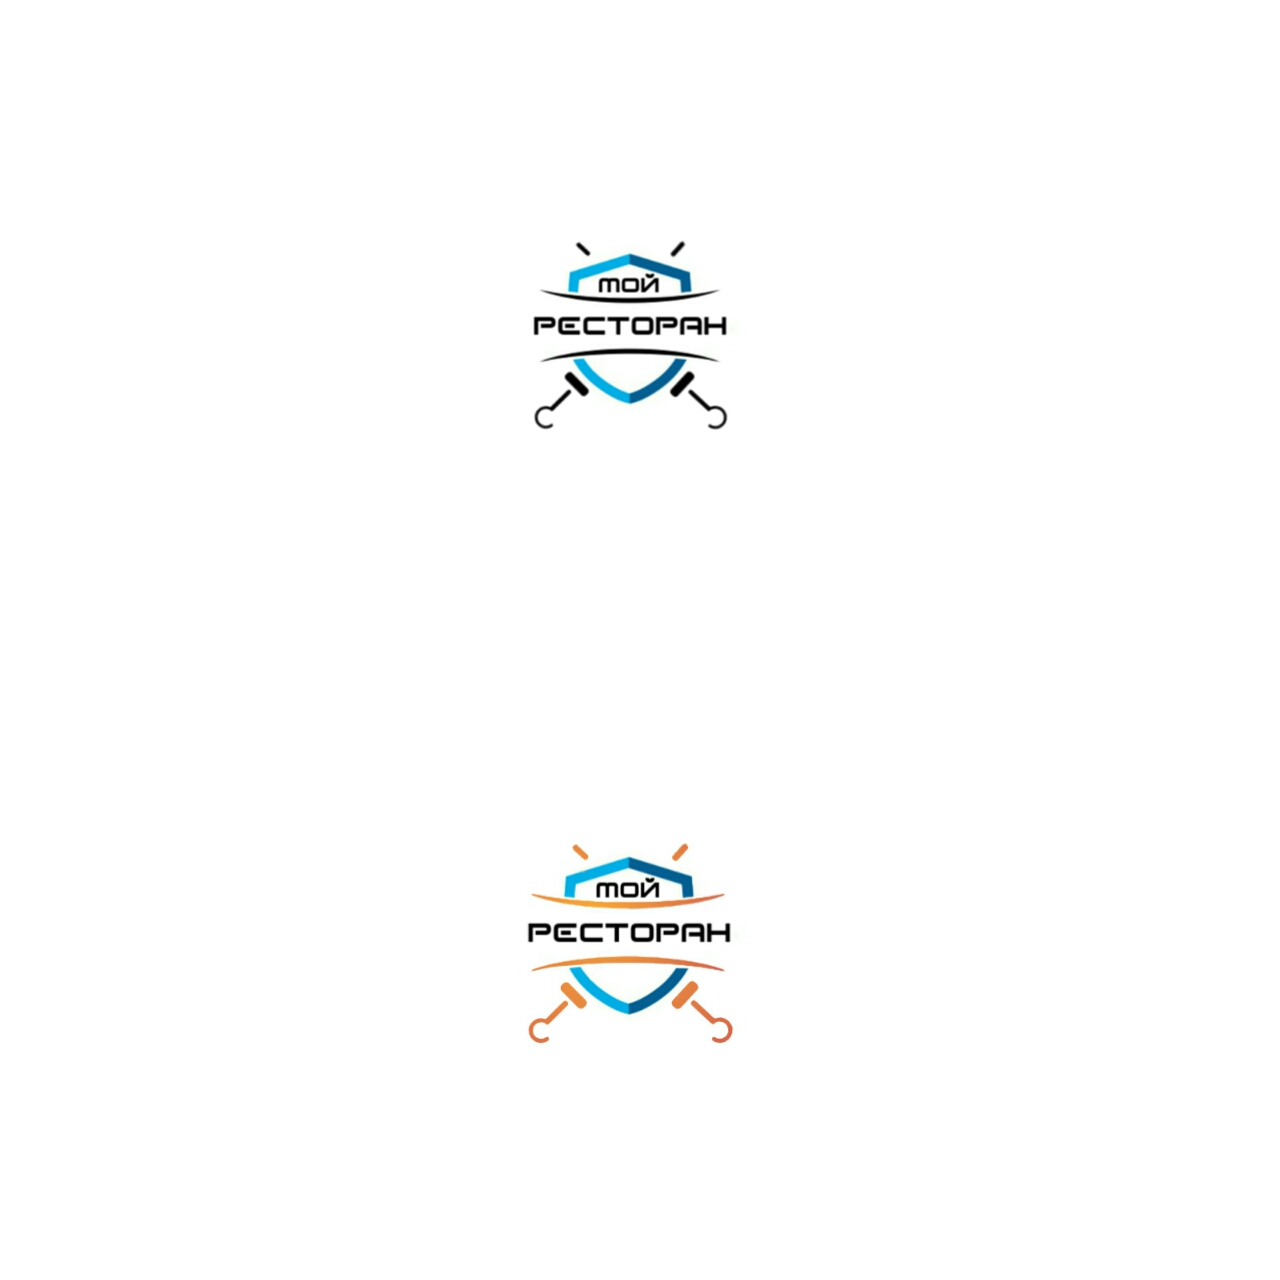 Разработать логотип и фавикон для IT- компании фото f_1995d52fa3790c6c.jpg